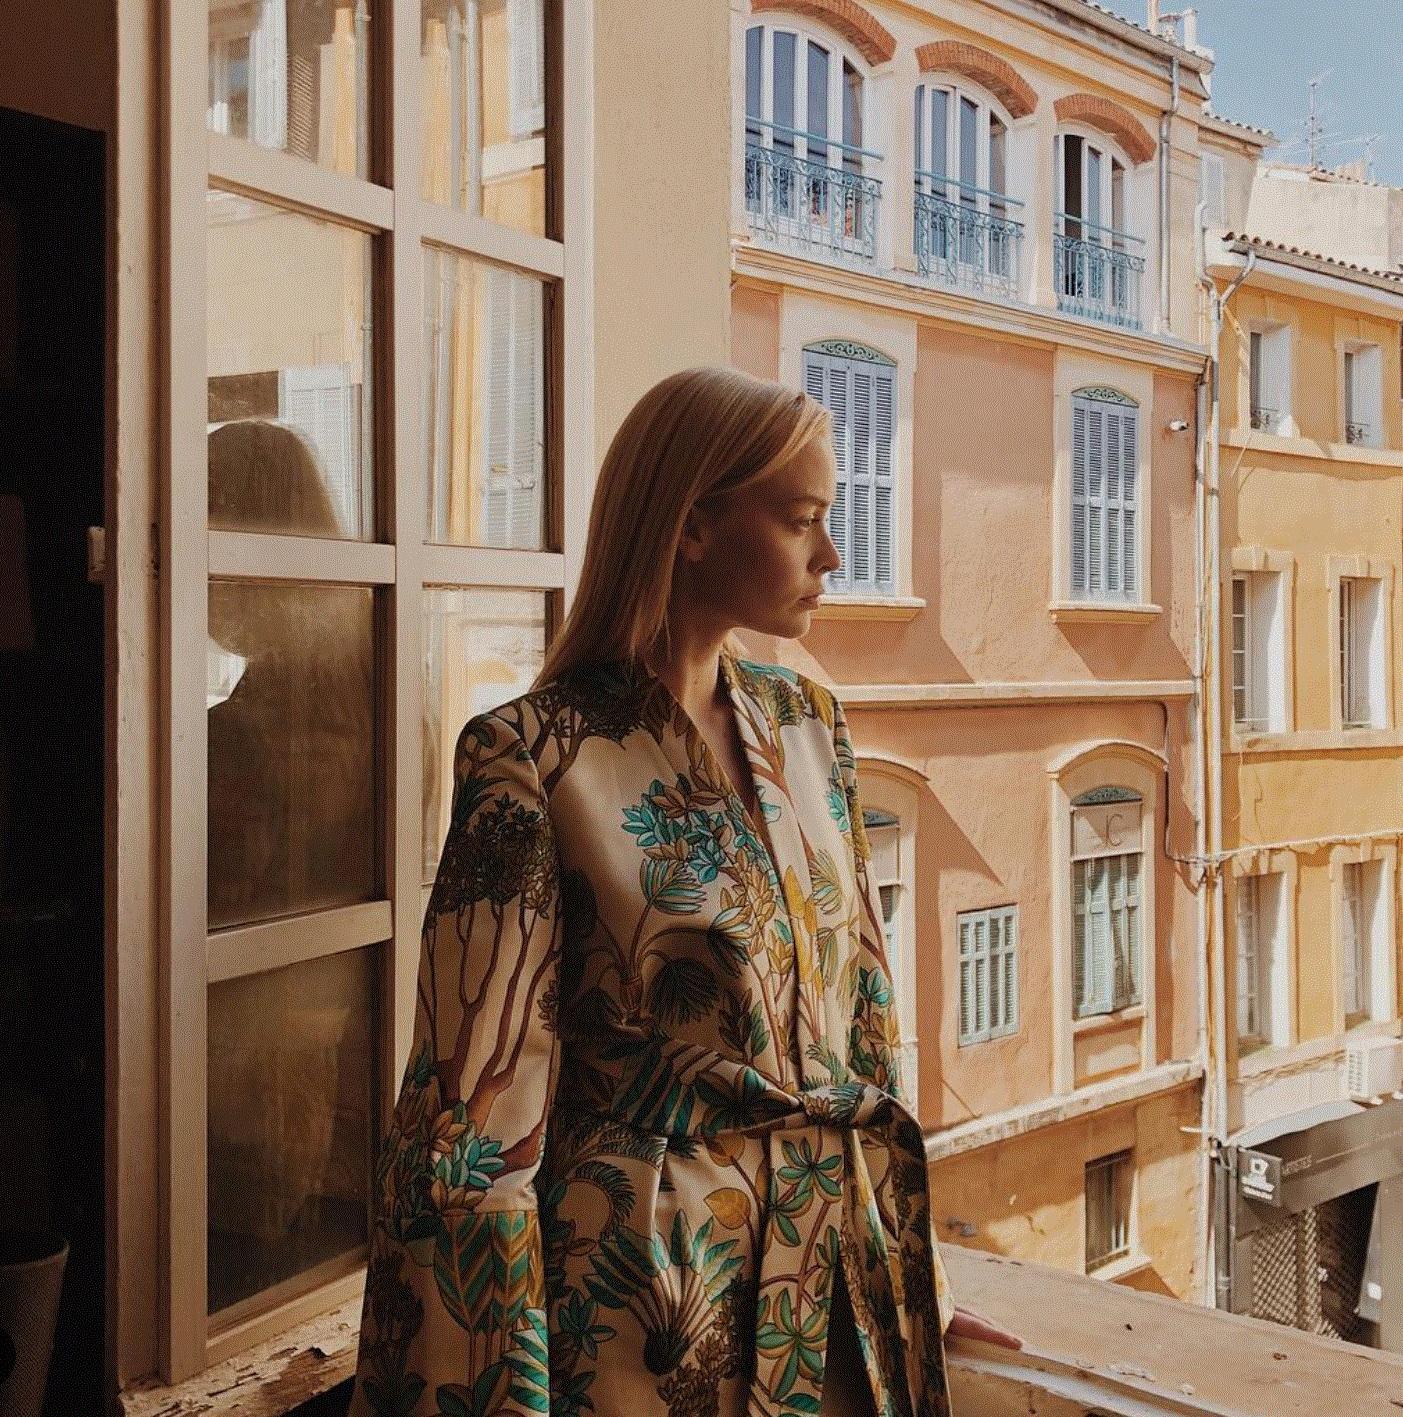 EMMA HOUV - Selvatica Biright Robe  #almagirl #girlboss  @South of France